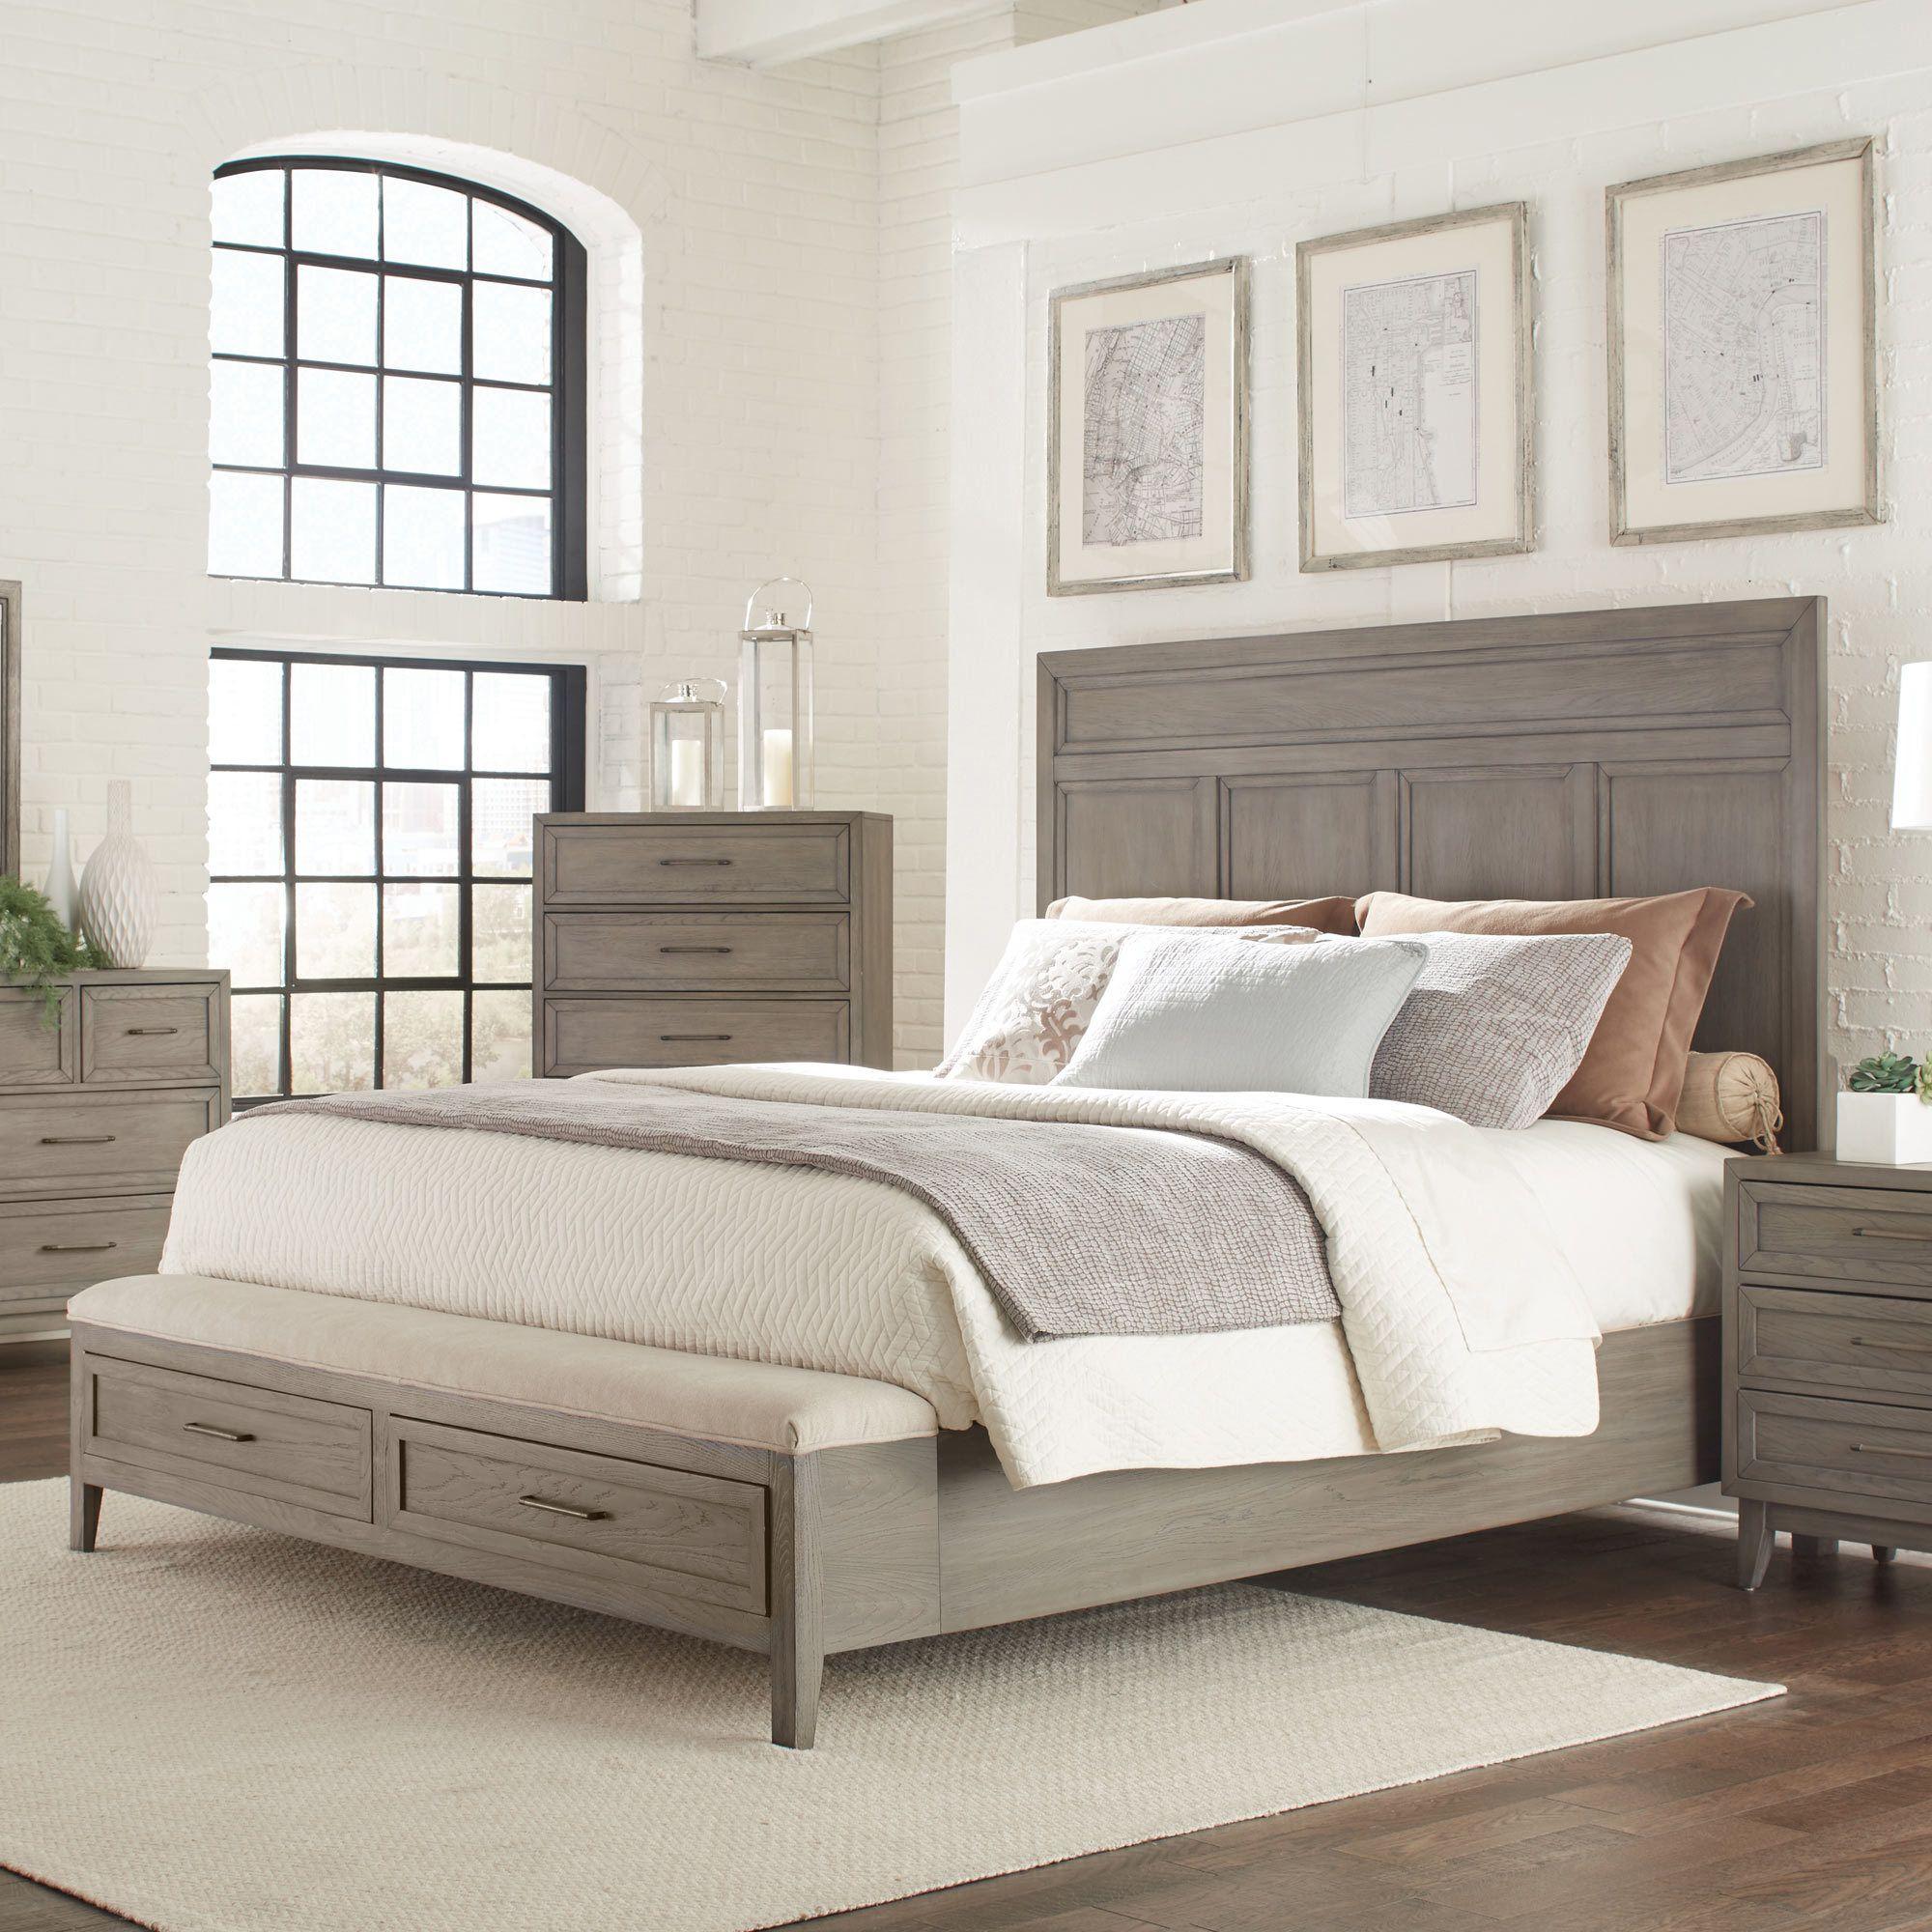 Vogue Queen Panel Storage Bed Riverside Furniture Home